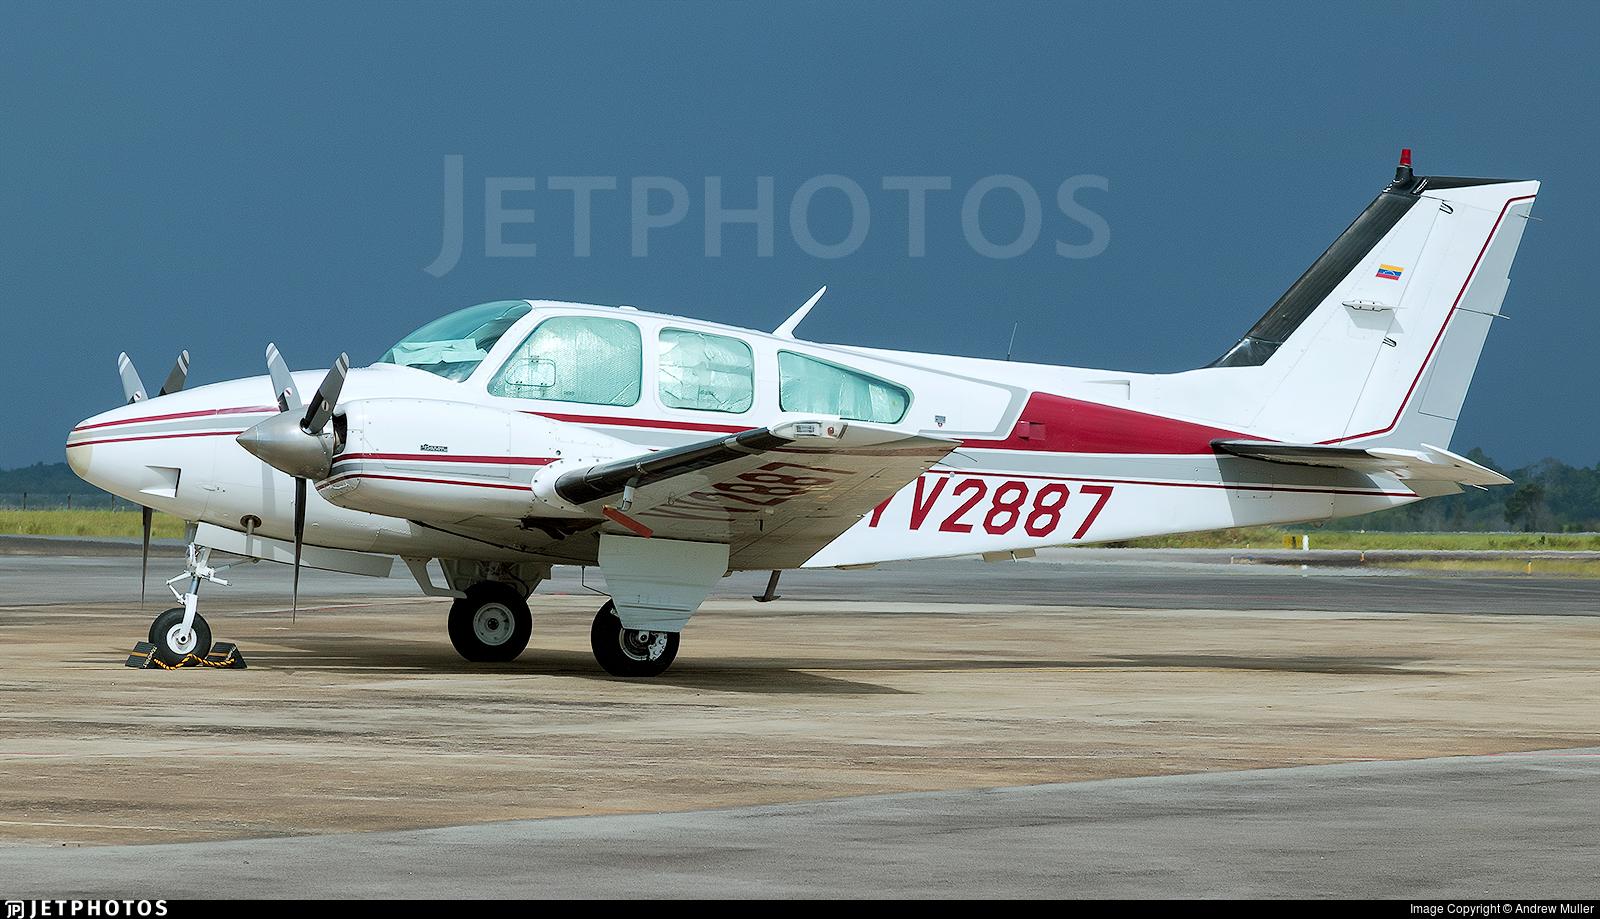 YV2887 - Beechcraft 95-B55 Baron - Private